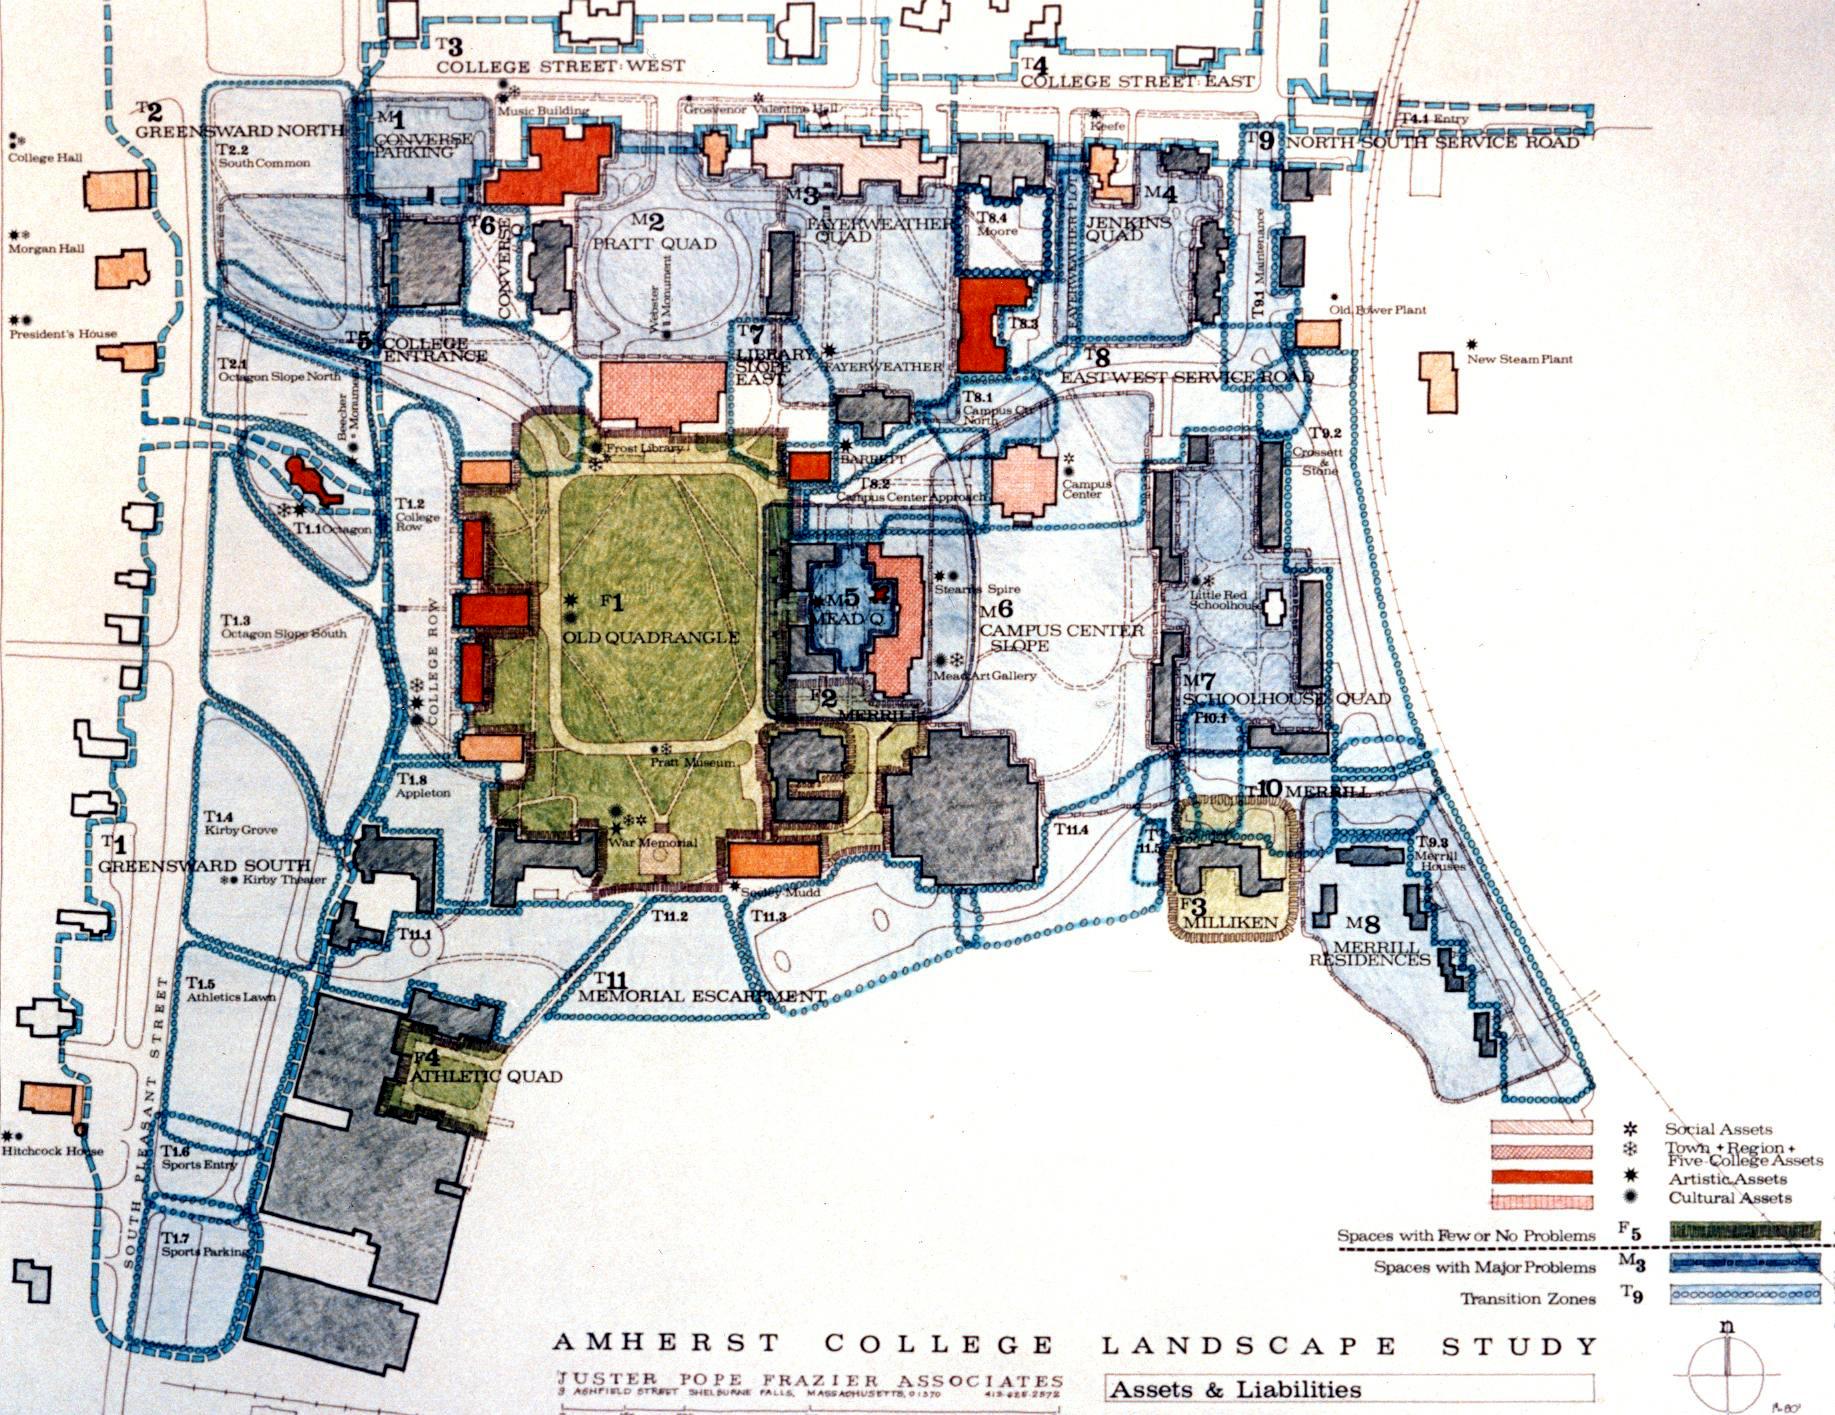 Amherst College Landscape Plan